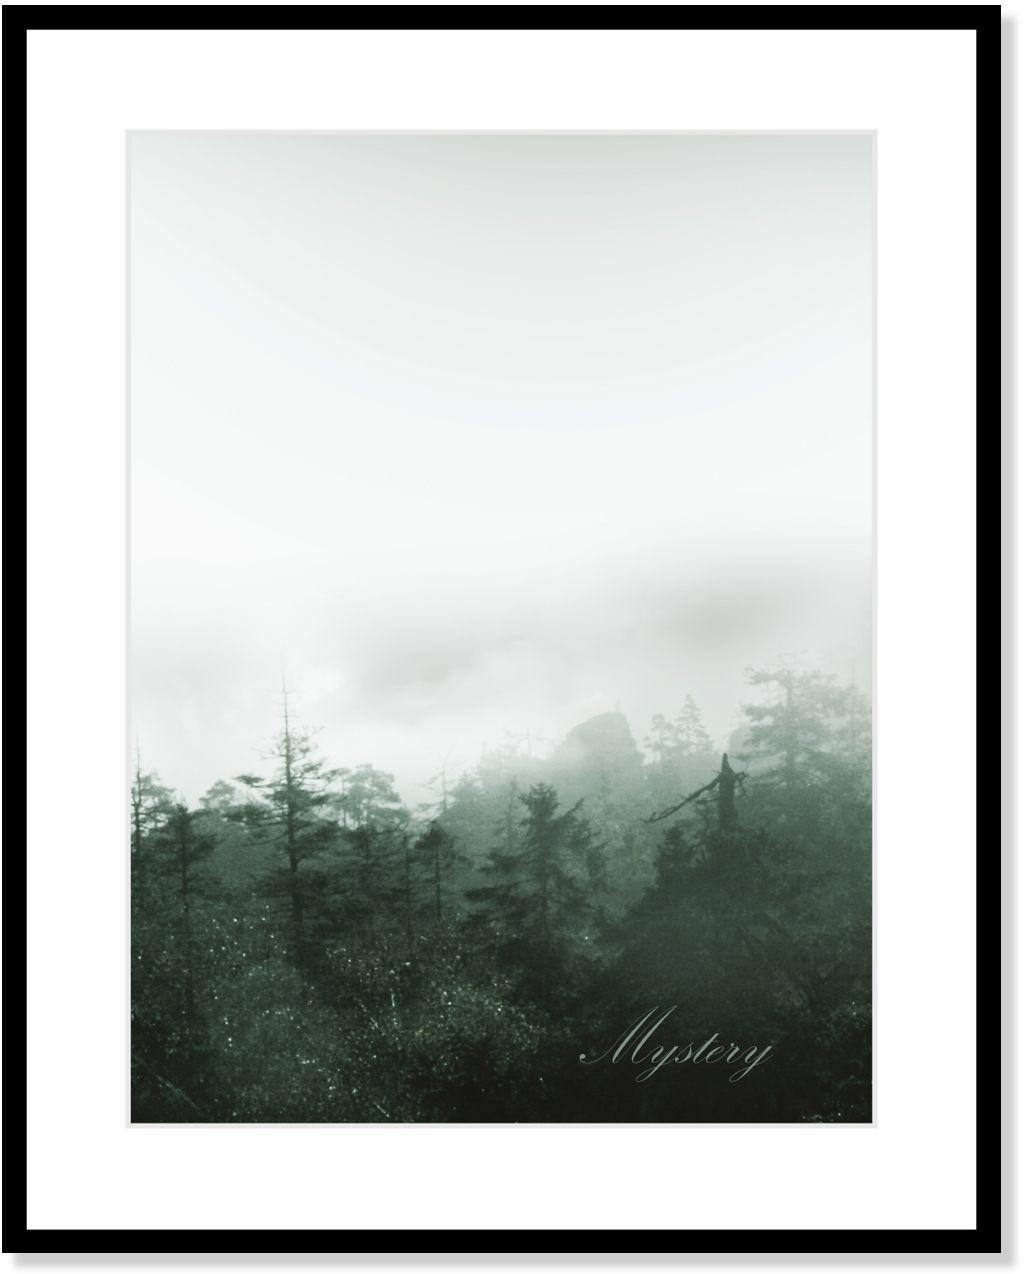 Obraz Mystery 40x50cm, 40x50cm